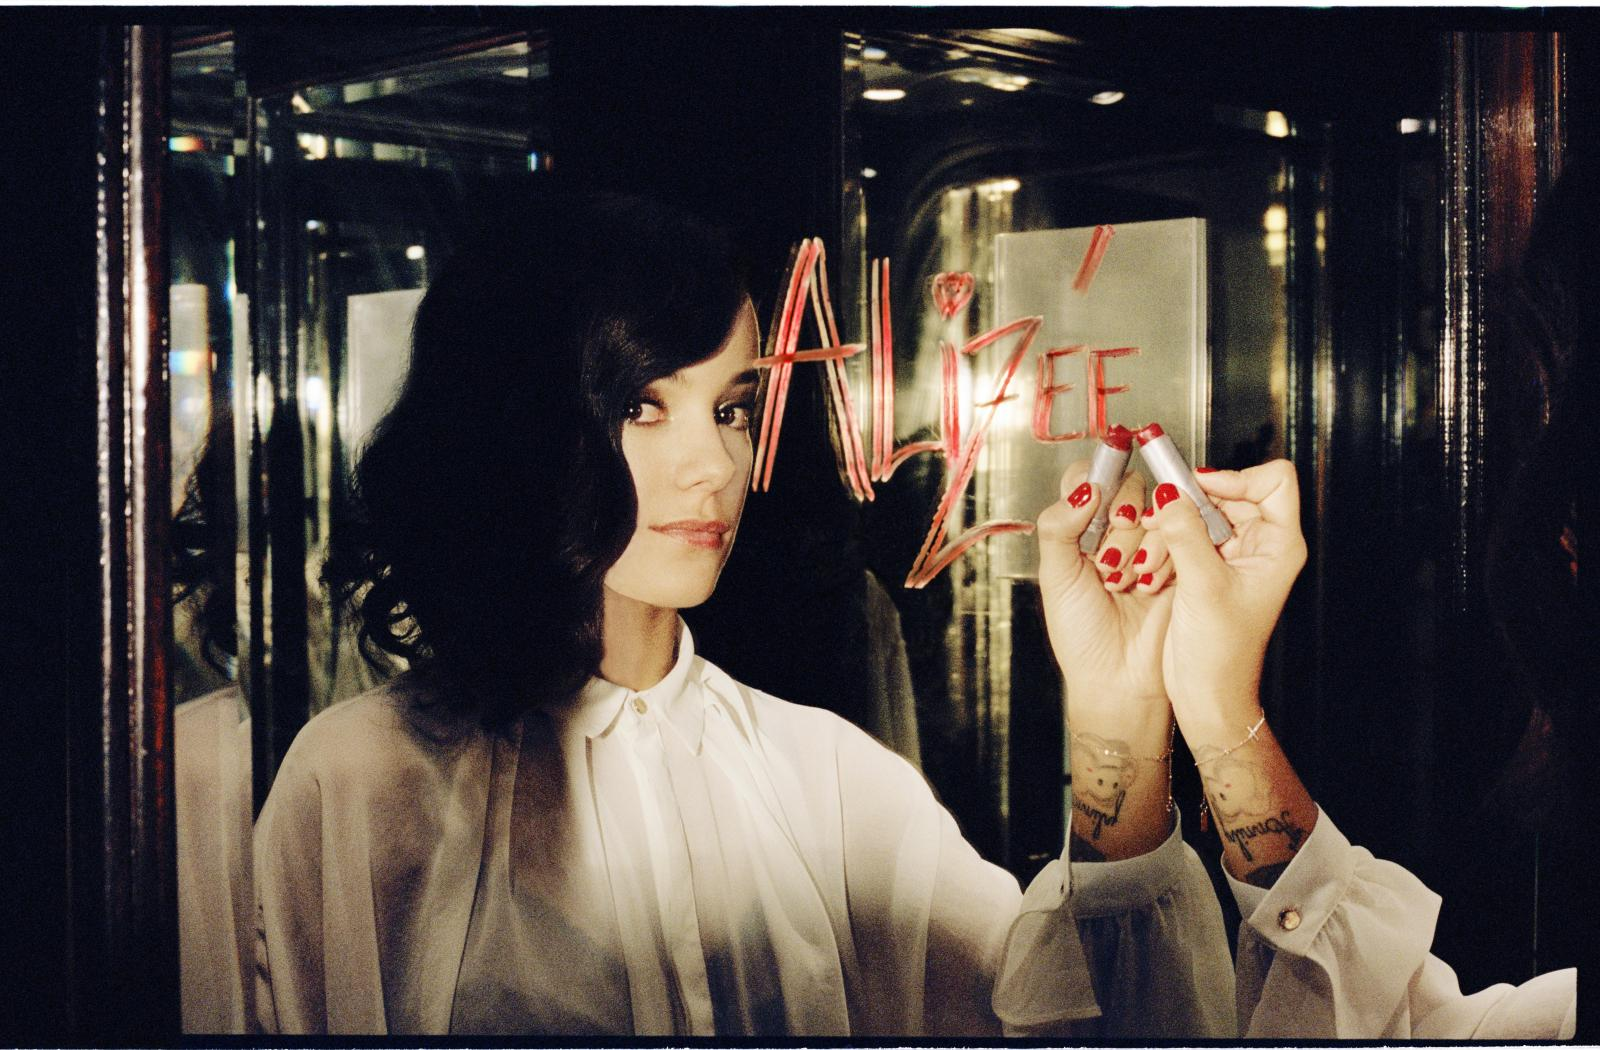 Французская певица ализе стриптиз 18 ...